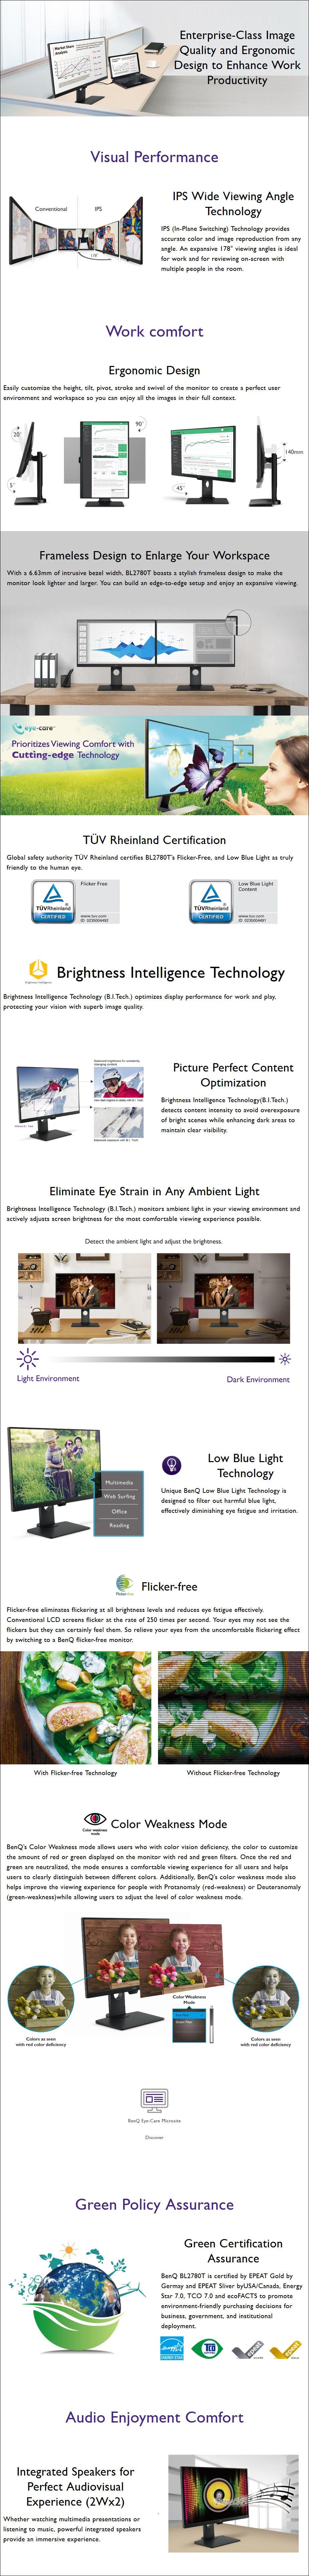 "BenQ BL2480T 23.8"" Full HD Ergonomic IPS Business Monitor - Overview 1"